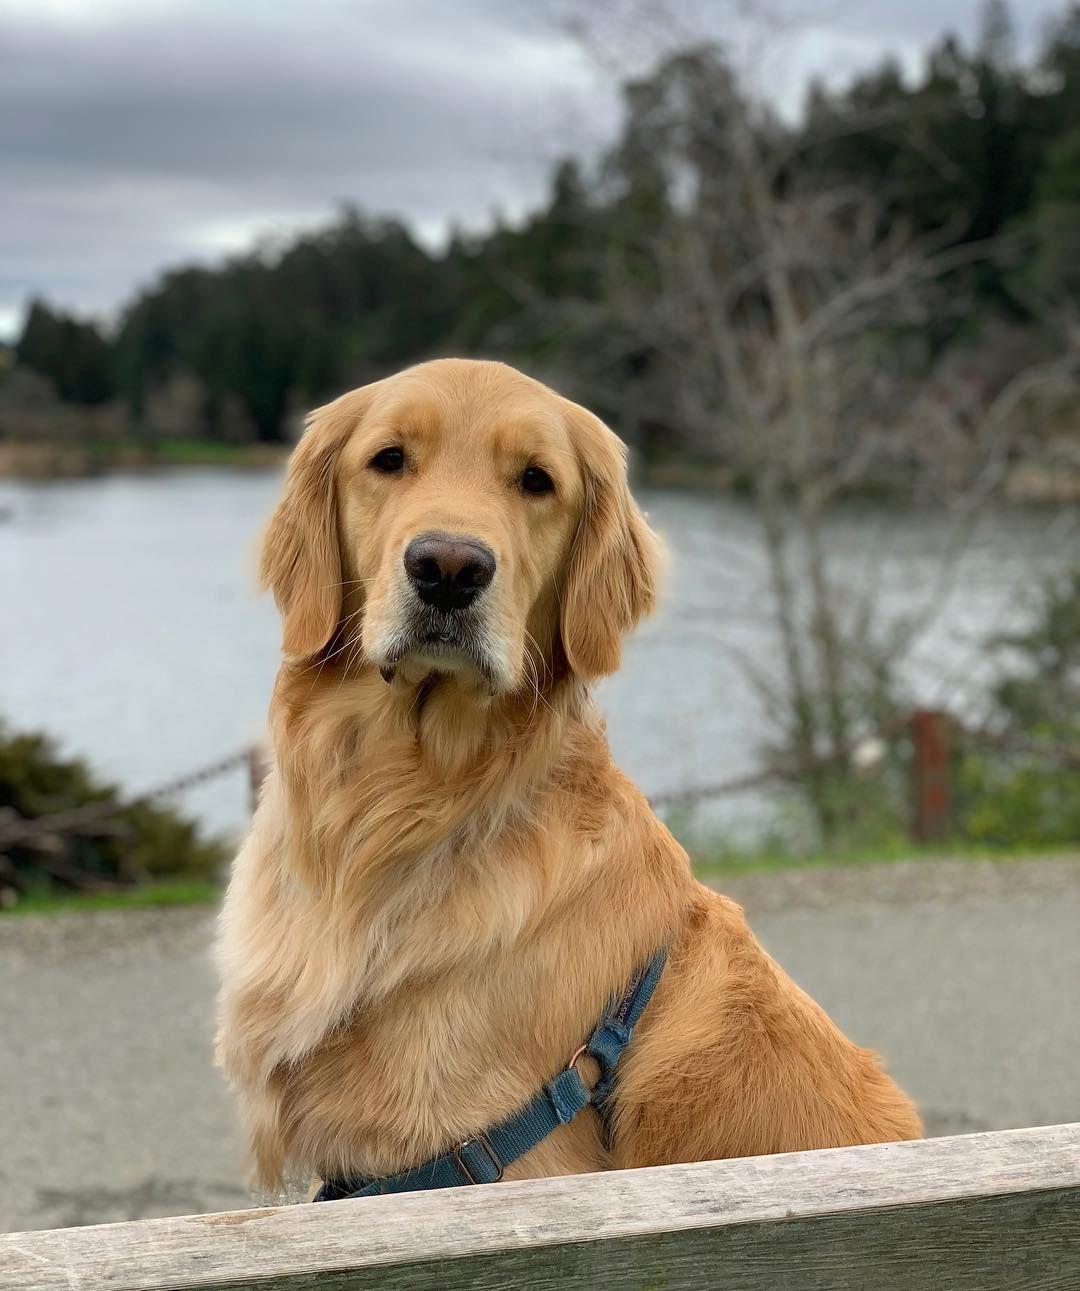 Oliver The Golden Retriever On Instagram Lake Life Dog